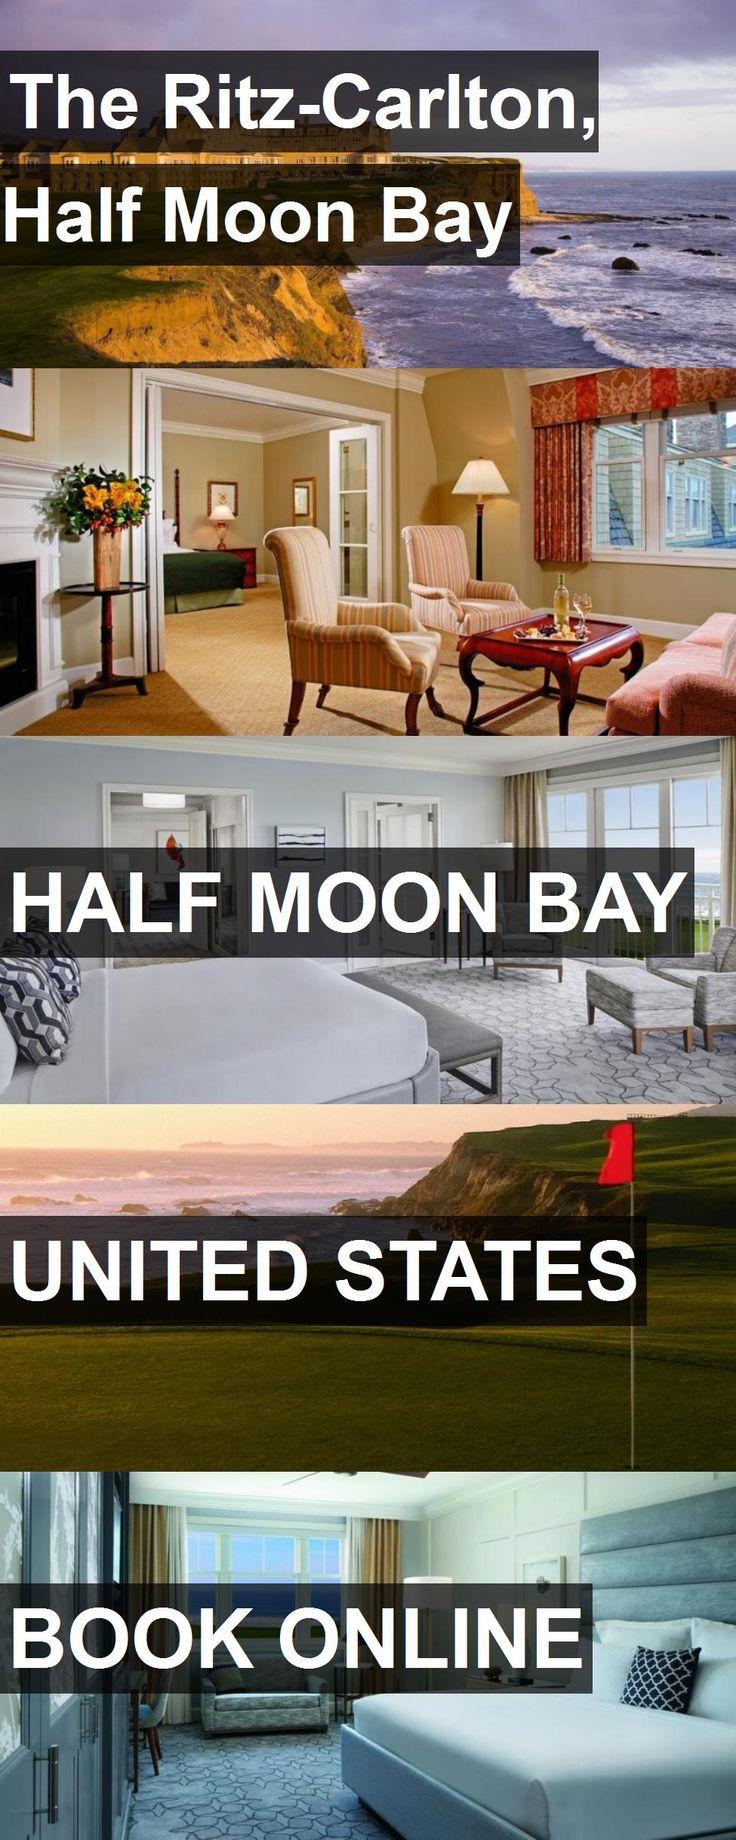 San Francisco Map Ritz Carlton%0A Hotel The RitzCarlton  Half Moon Bay in Half Moon Bay  United States